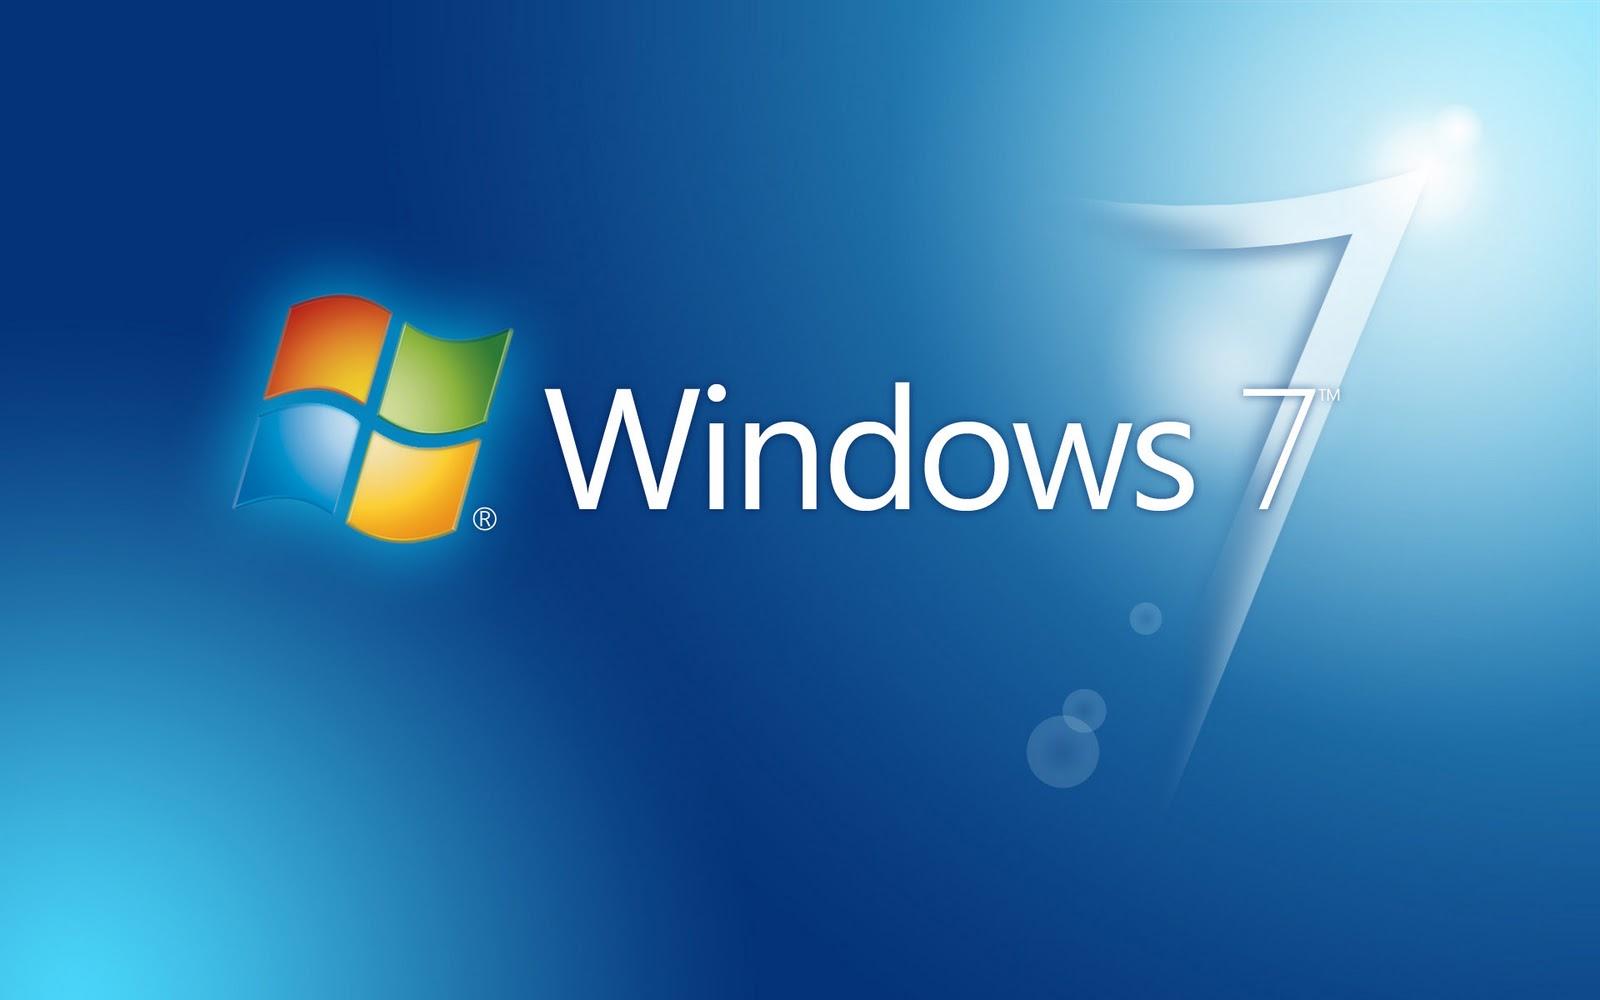 Live Wallpaper Windows 7 | ImageBank.biz